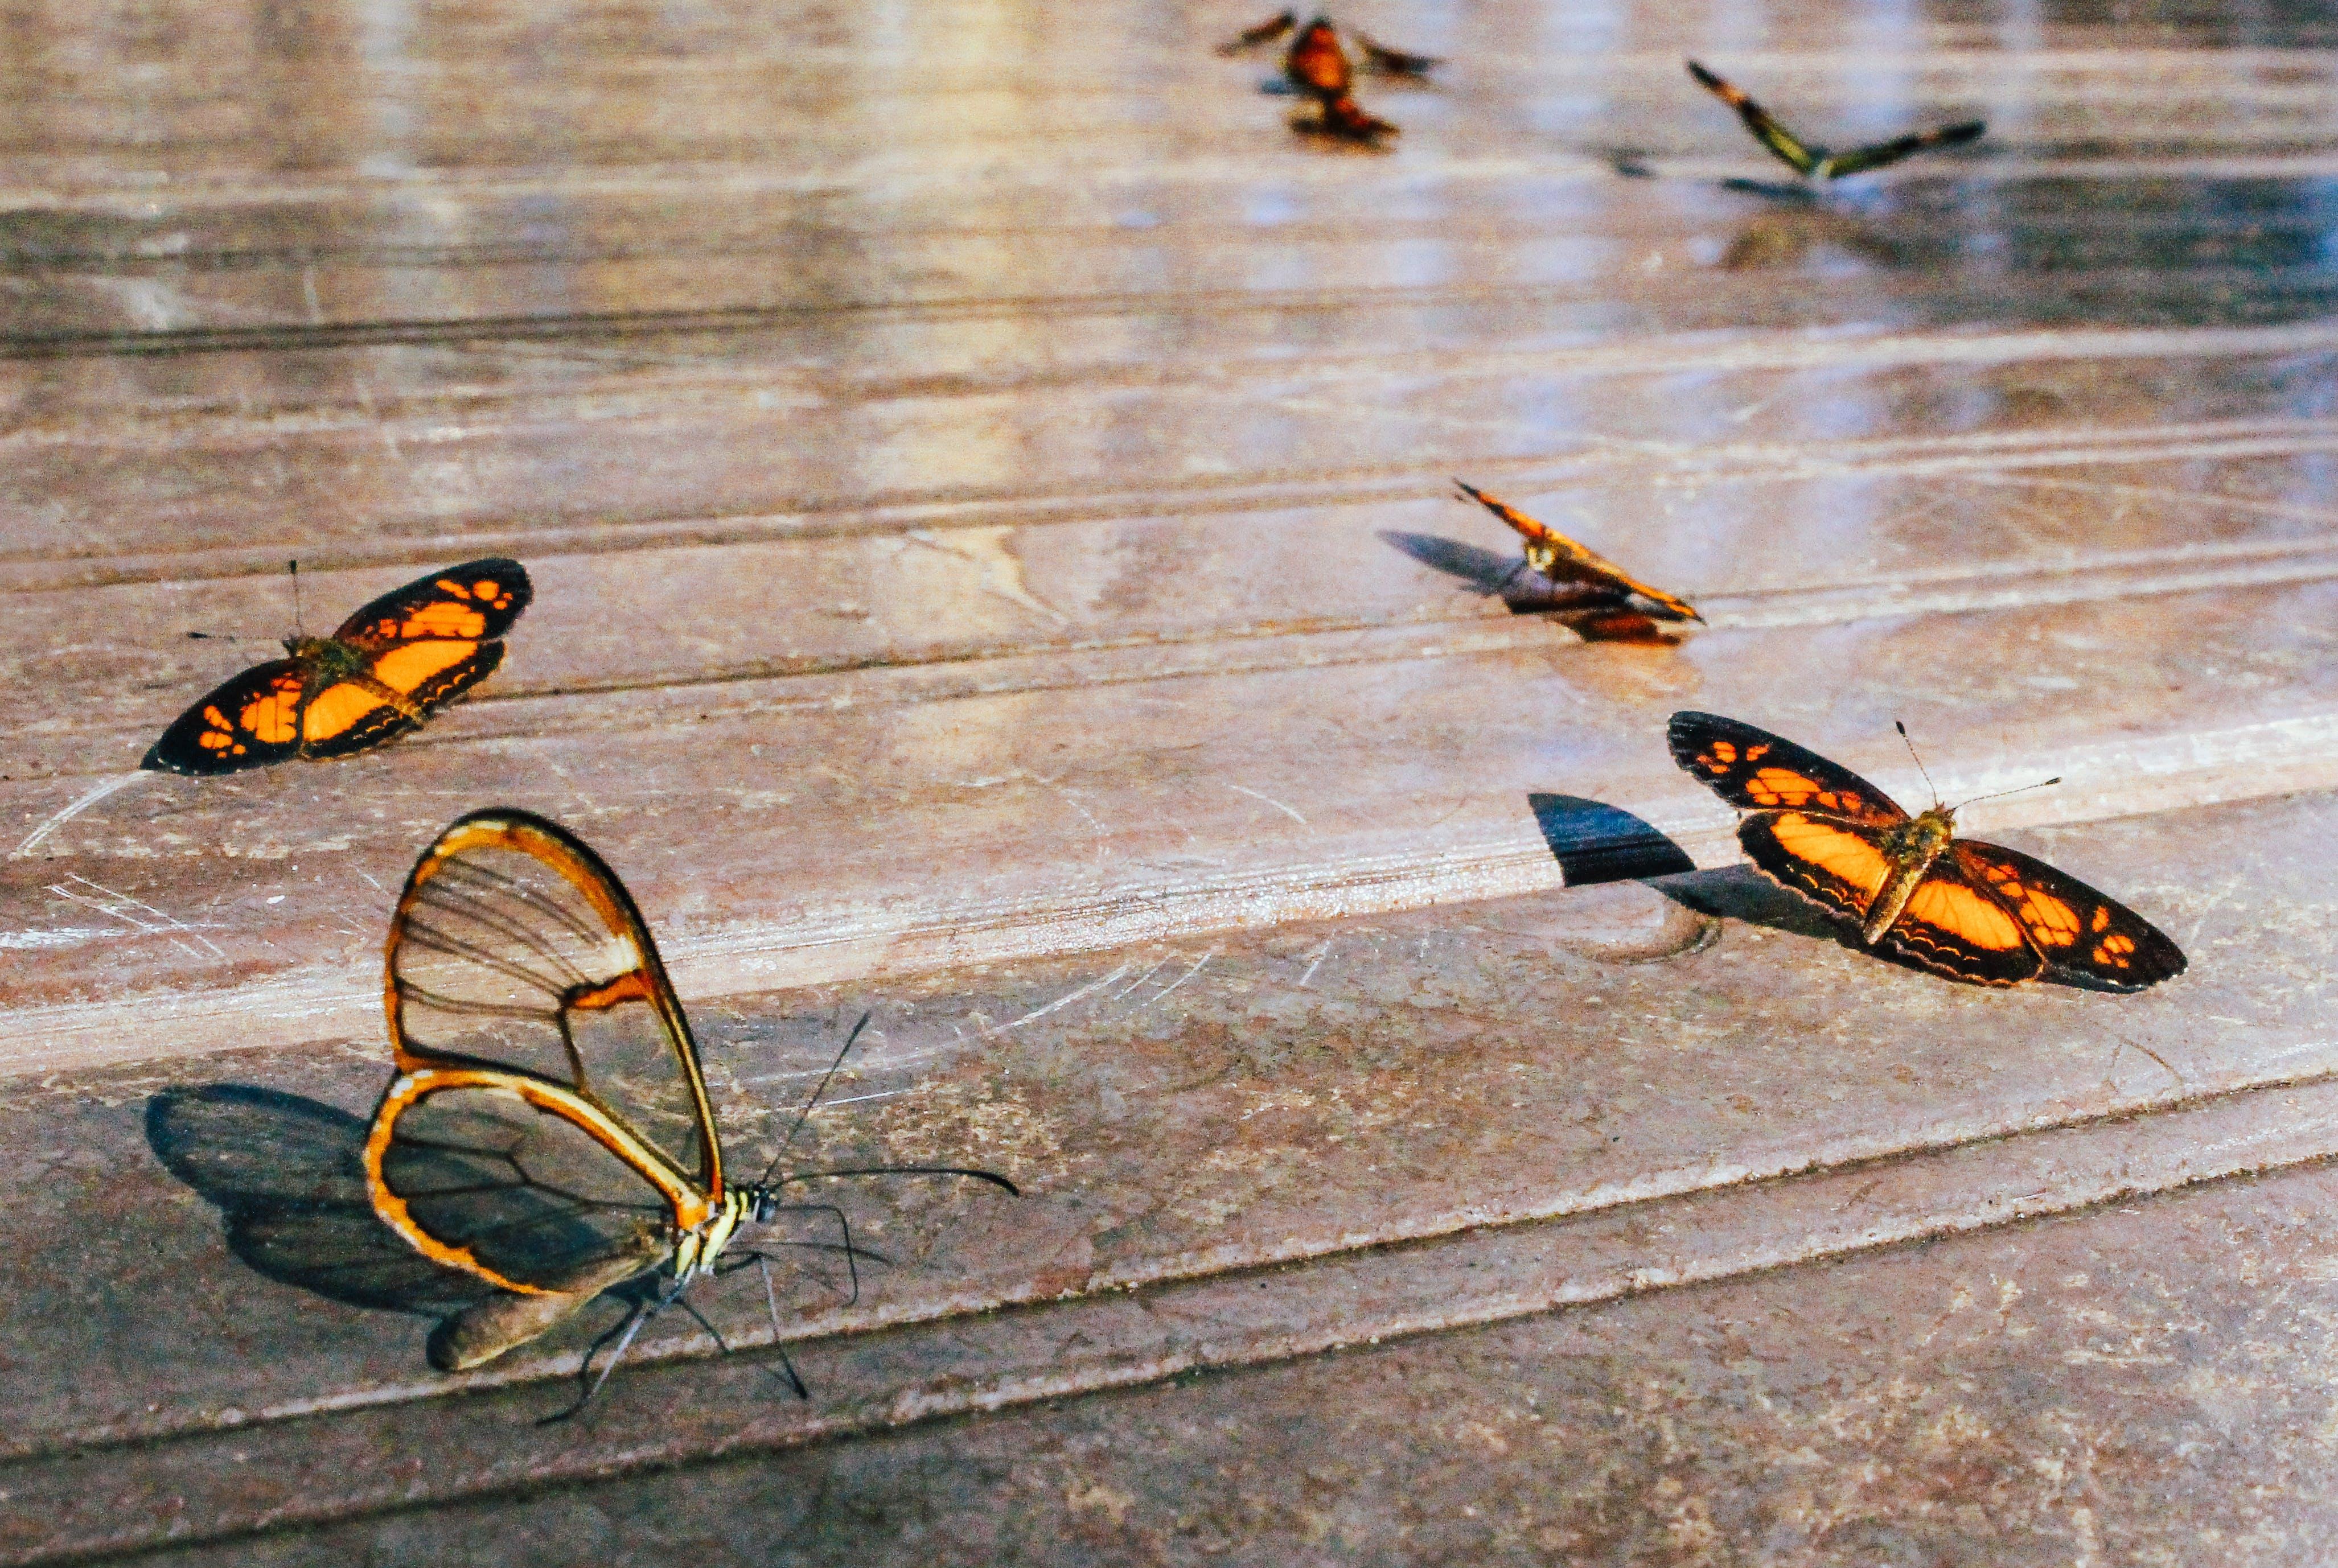 Butterflies Resting on Ground